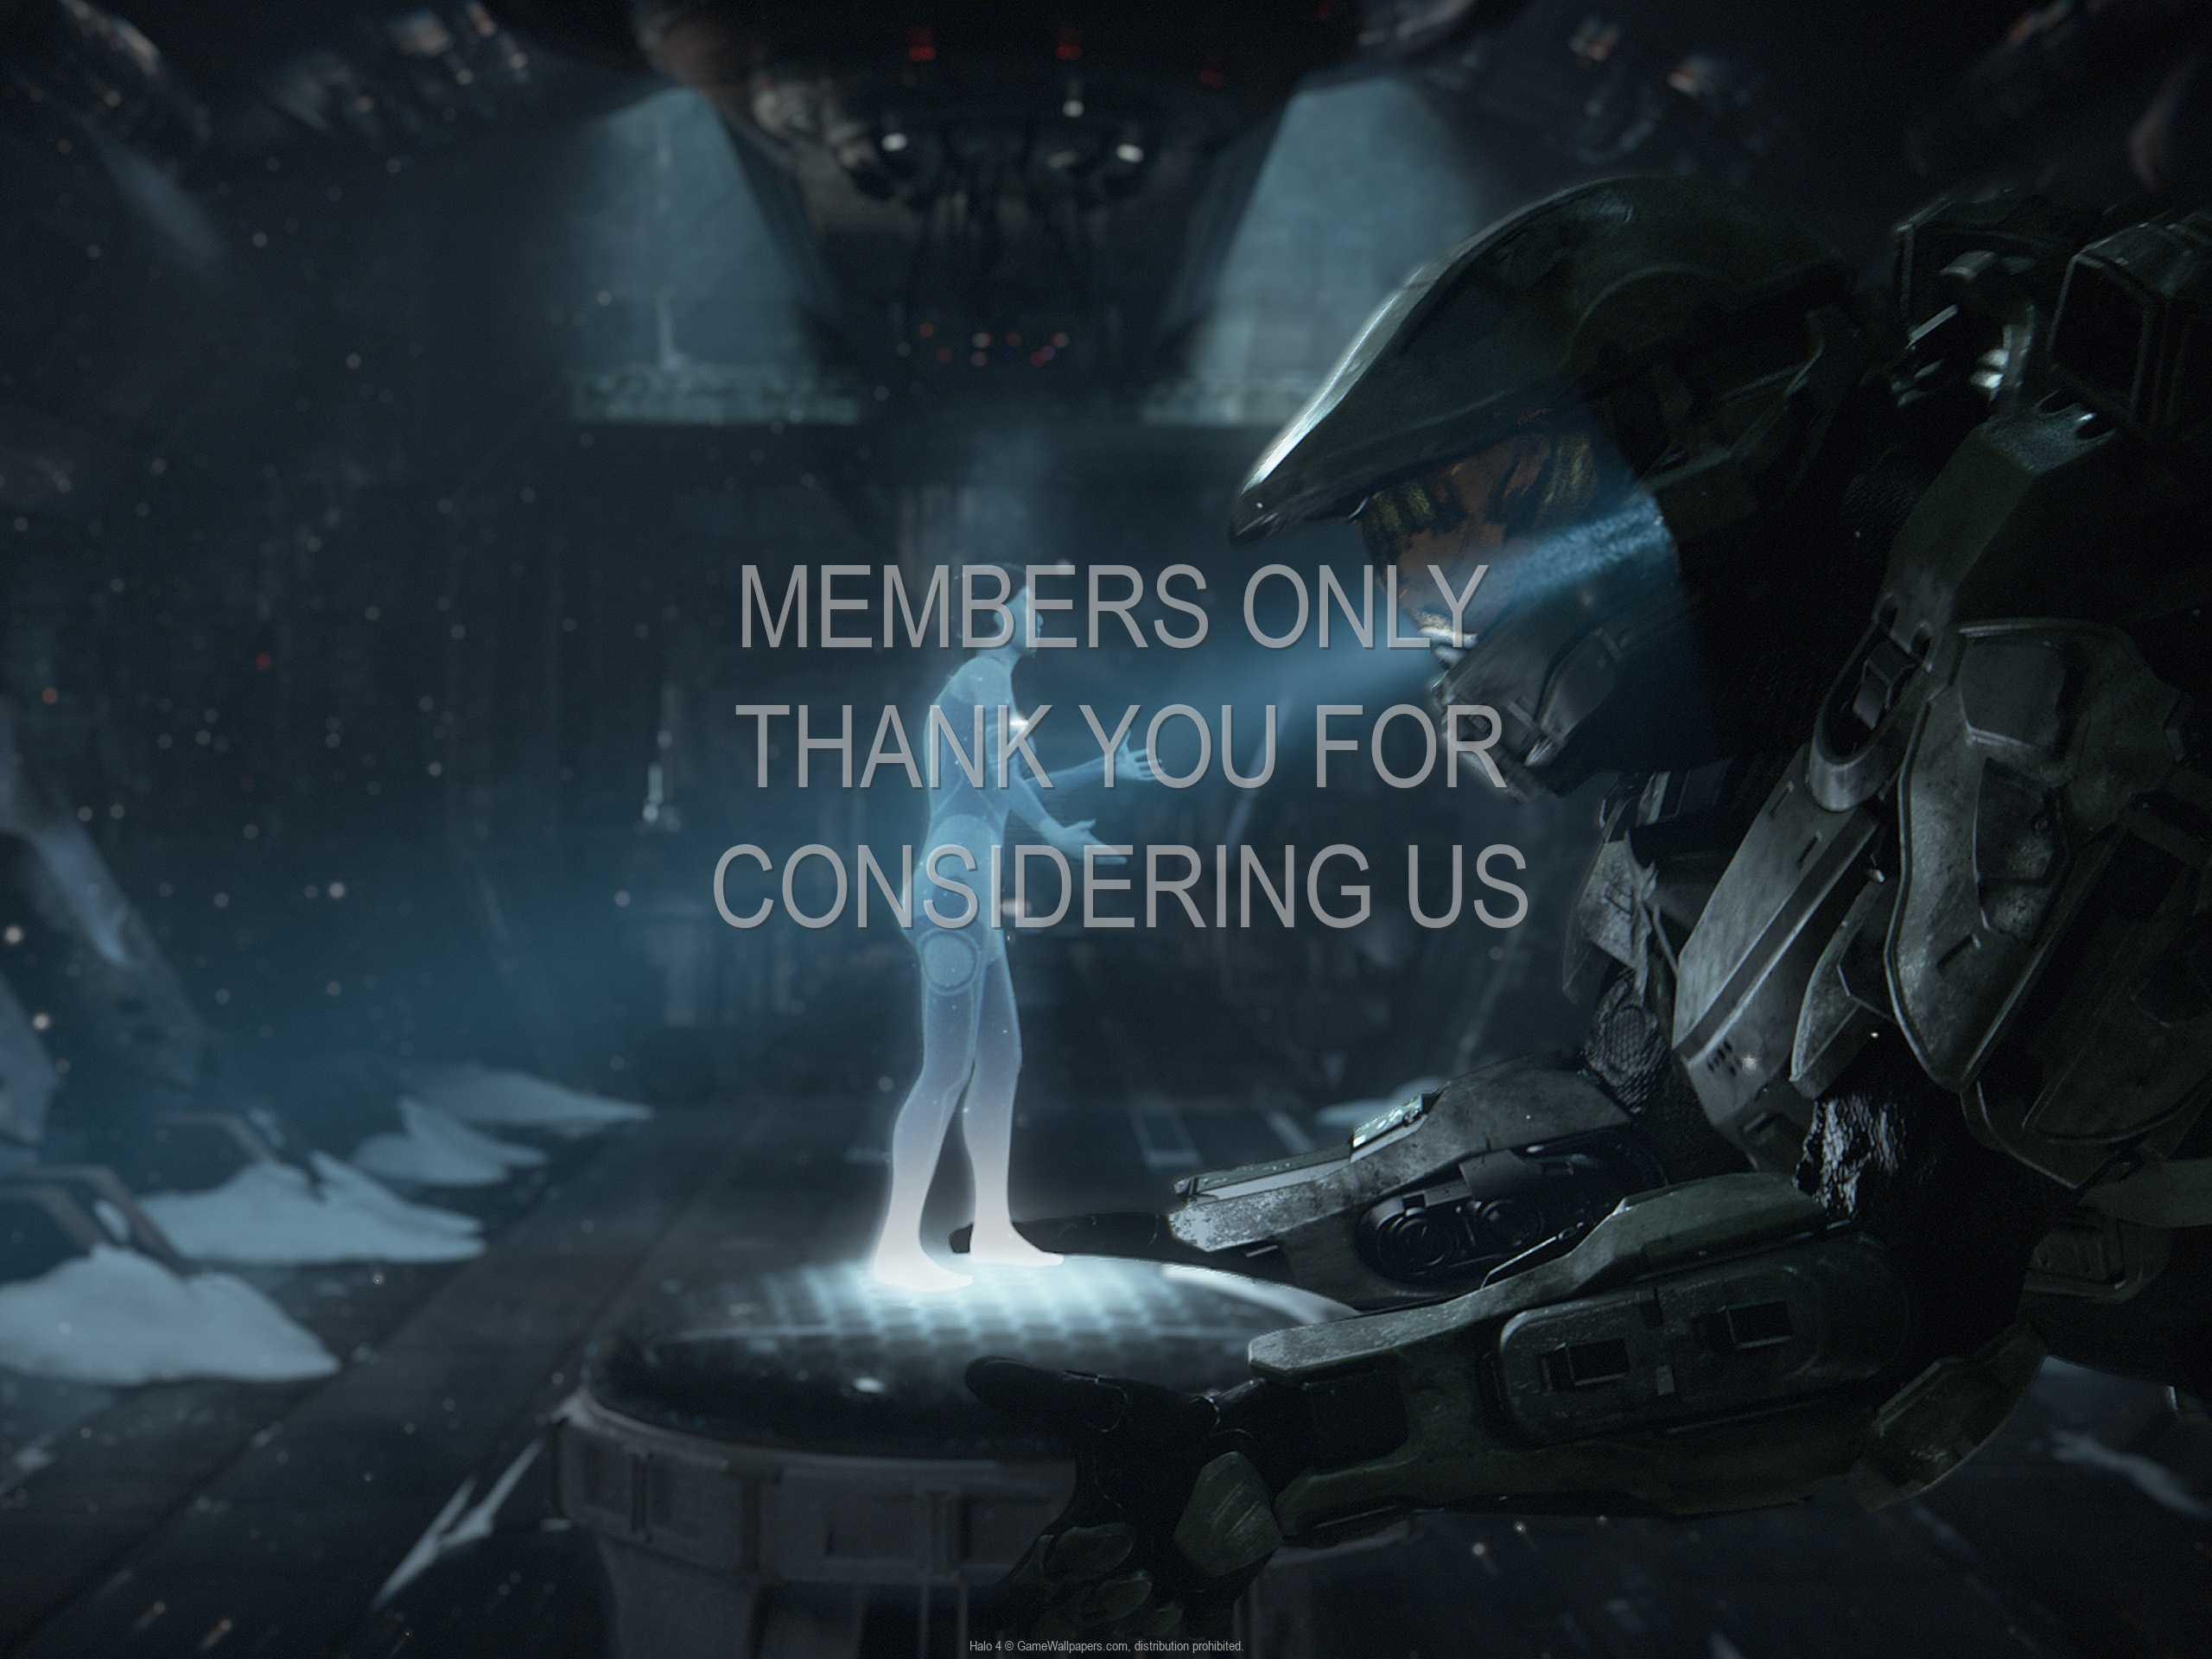 Halo 4 1080p Horizontal Handy Hintergrundbild 02